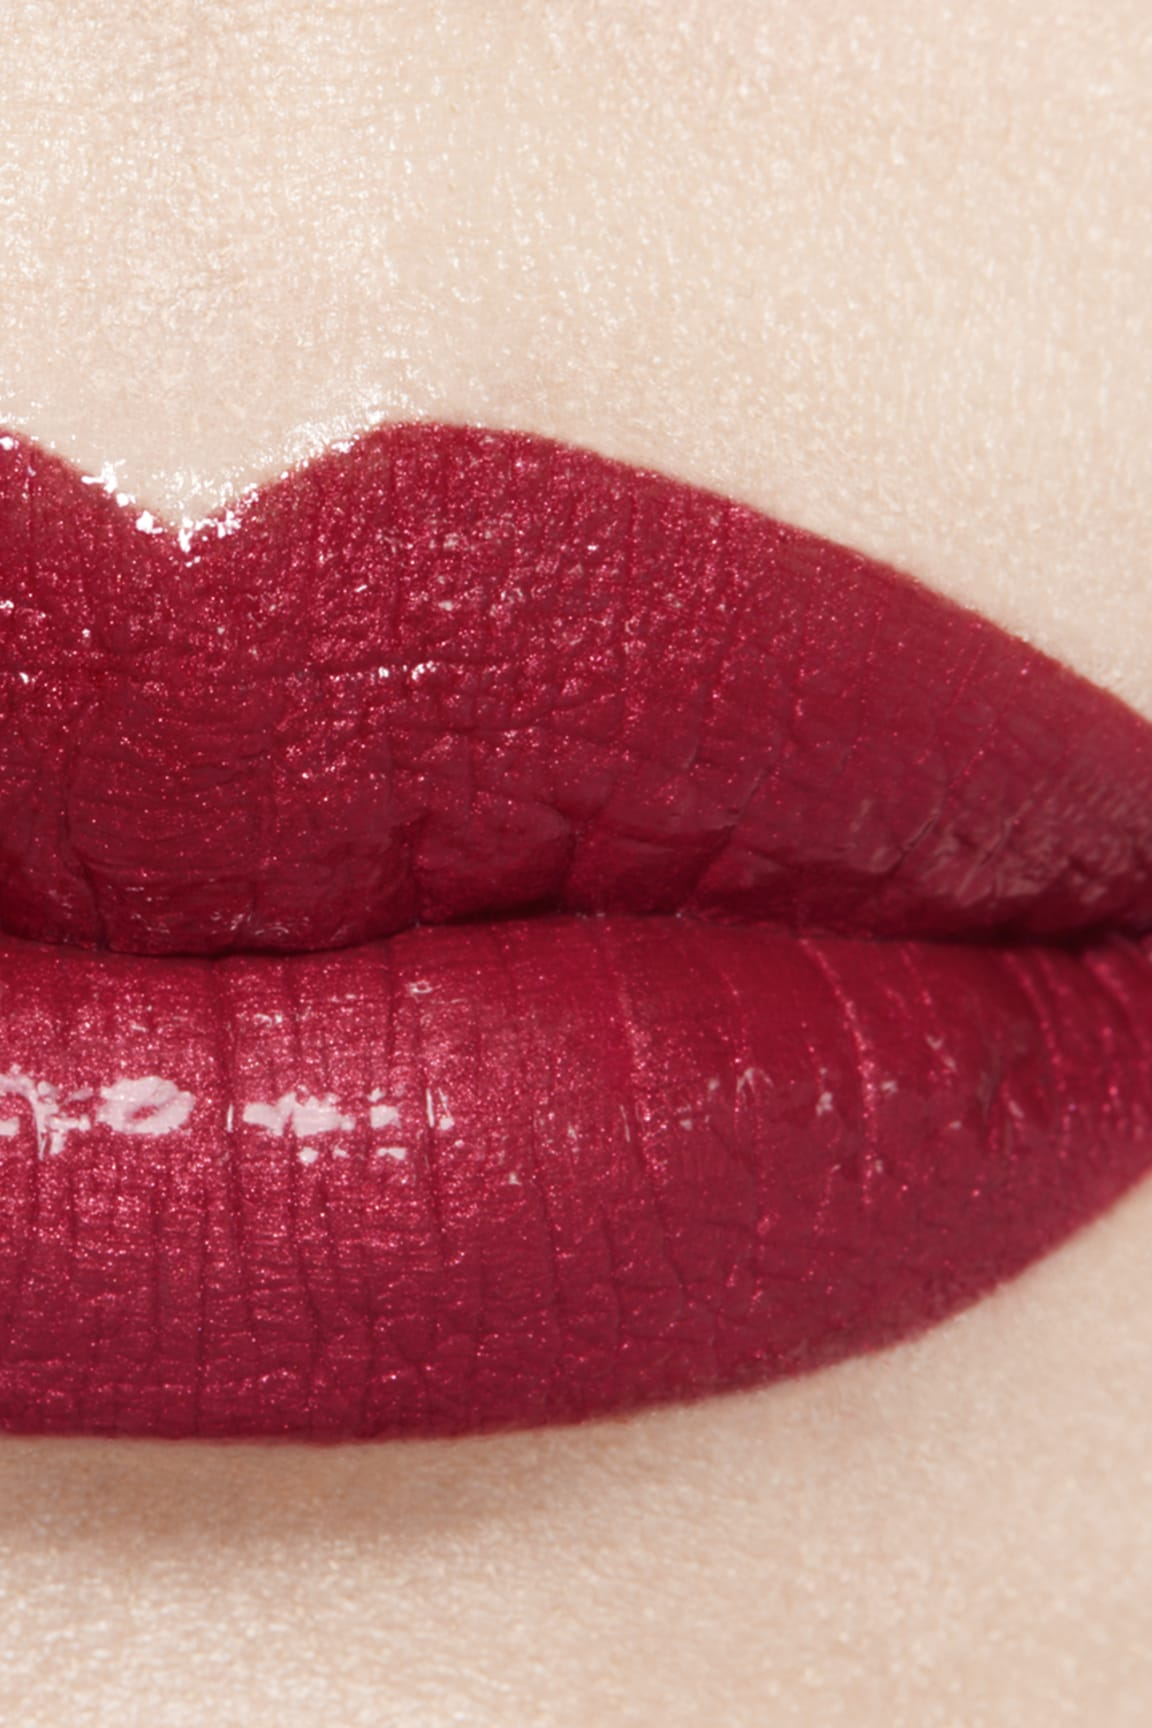 Anwendung Make-up-Bild 1 - ROUGE COCO BLOOM 142 - BURST